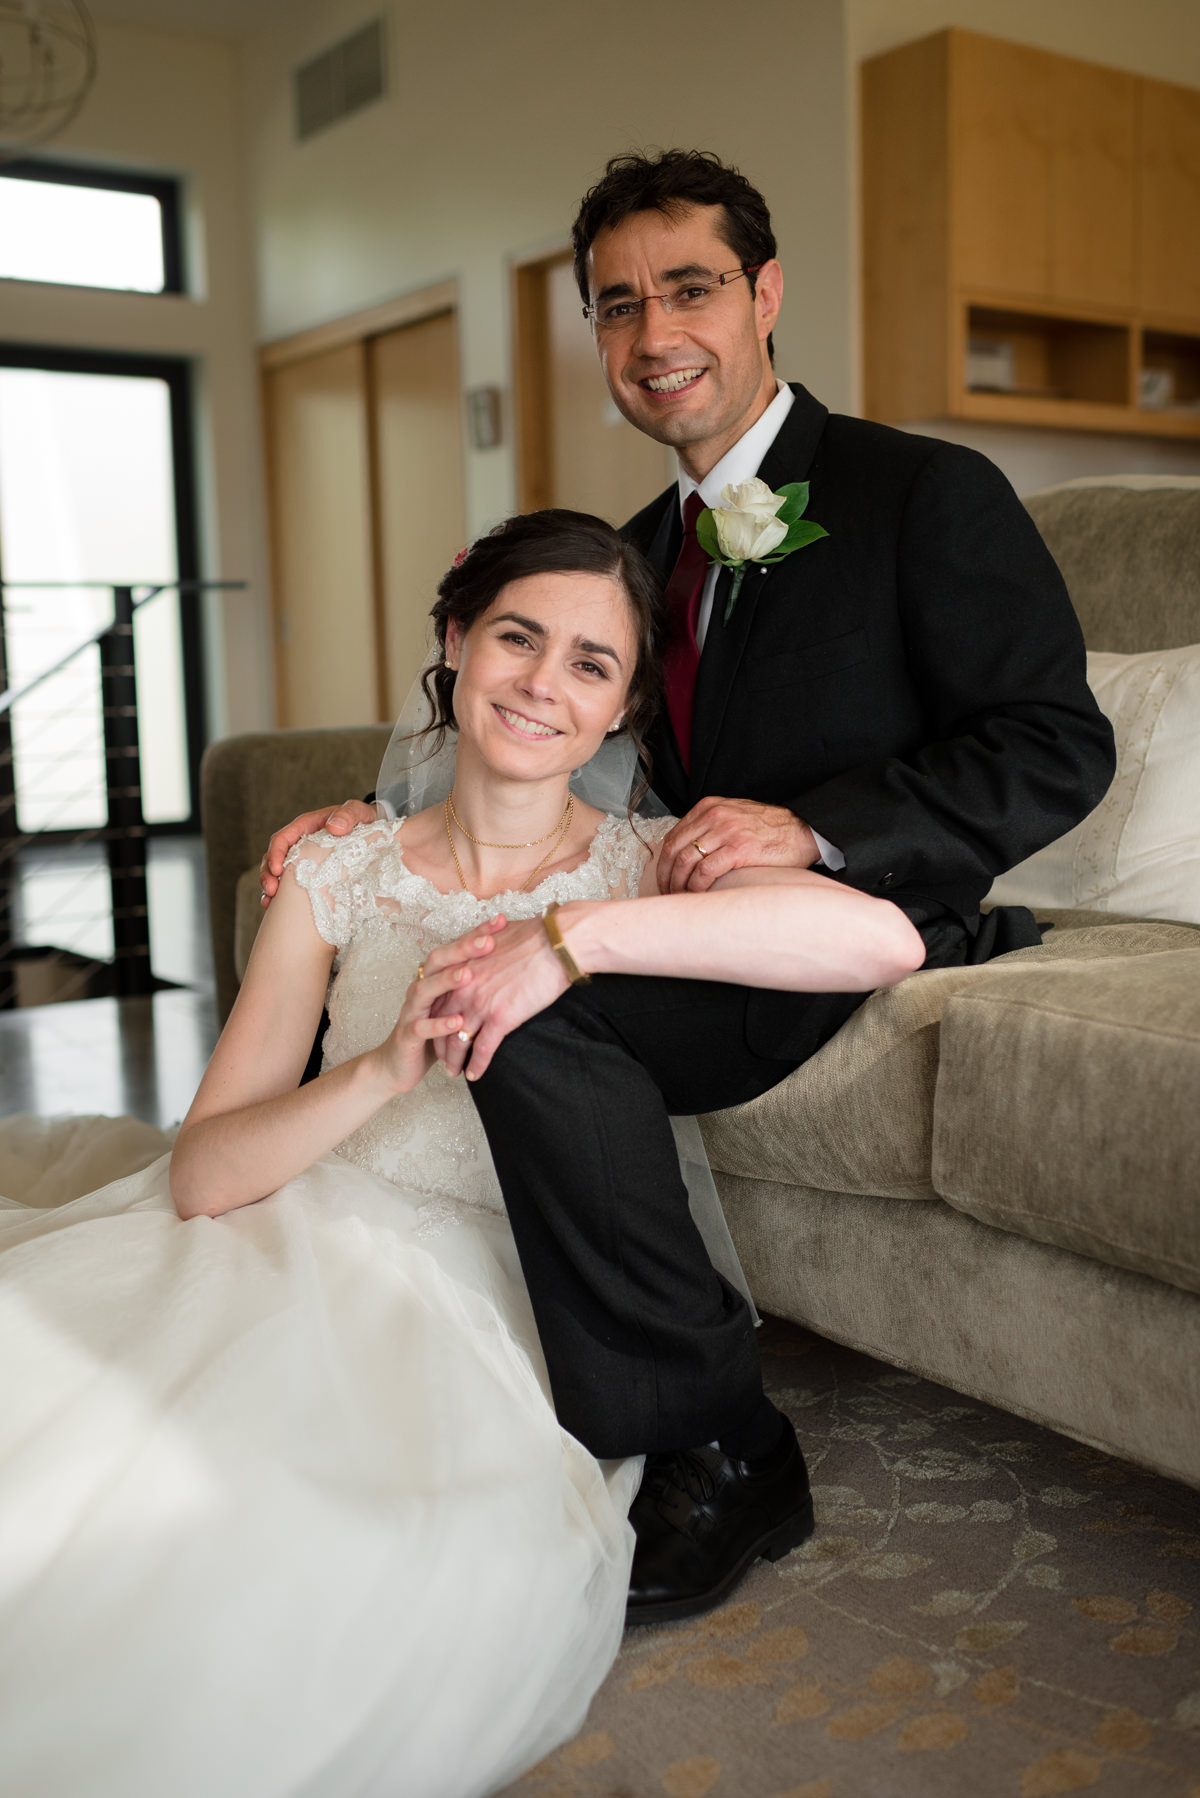 Andrew Tat - Documentary Wedding Photography - Kirkland, Washington - Emily & Cuauh - 27.JPG